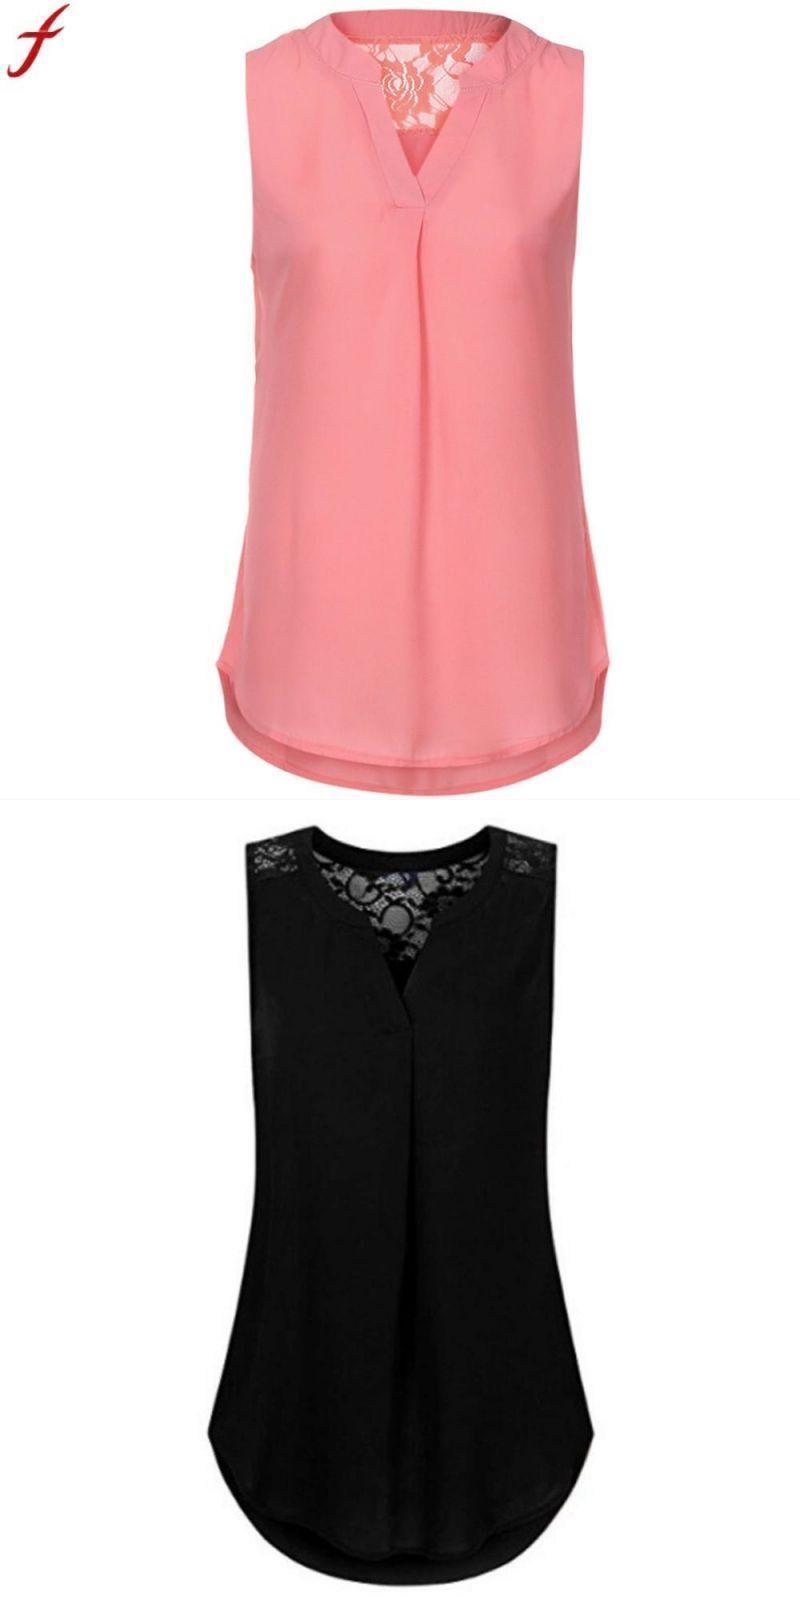 b5b69f46fae160 5xl summer tank tops 2018 sexy v neck back lace tunic tops chiffon  sleeveless vest casual